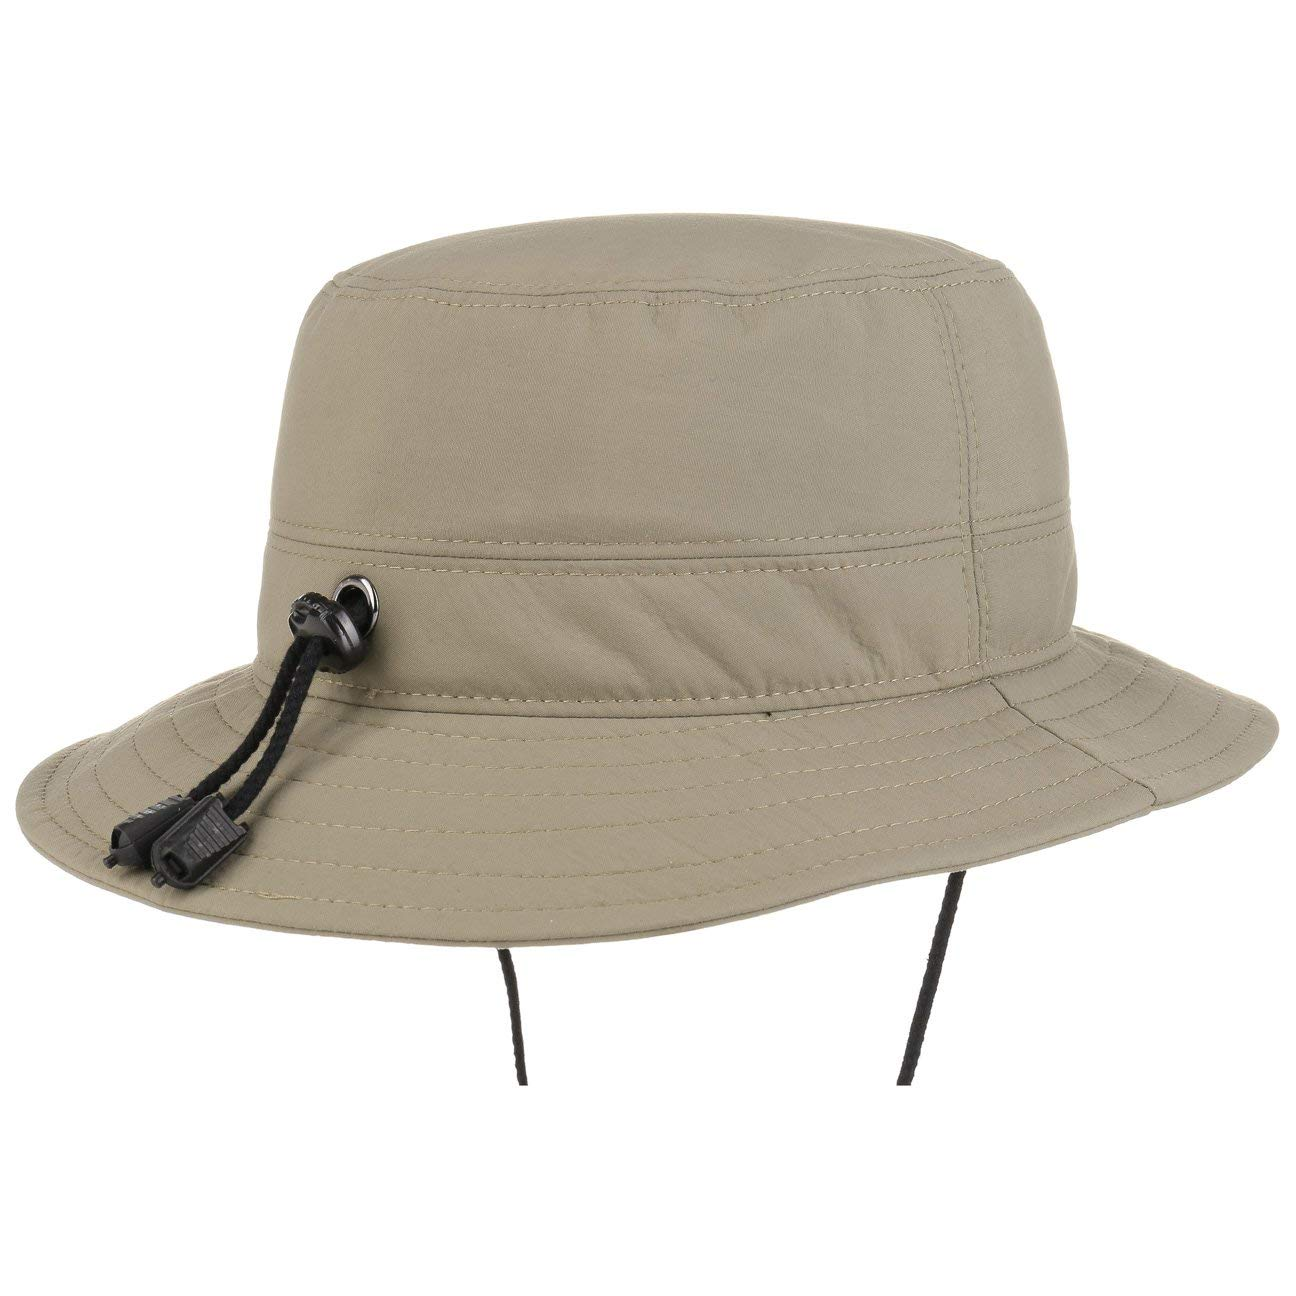 4347c6b063a Lierys Gore-Tex Bucket Rain Hat Outdoor (XL (60-61 cm) - Light Olive)   Amazon.co.uk  Clothing